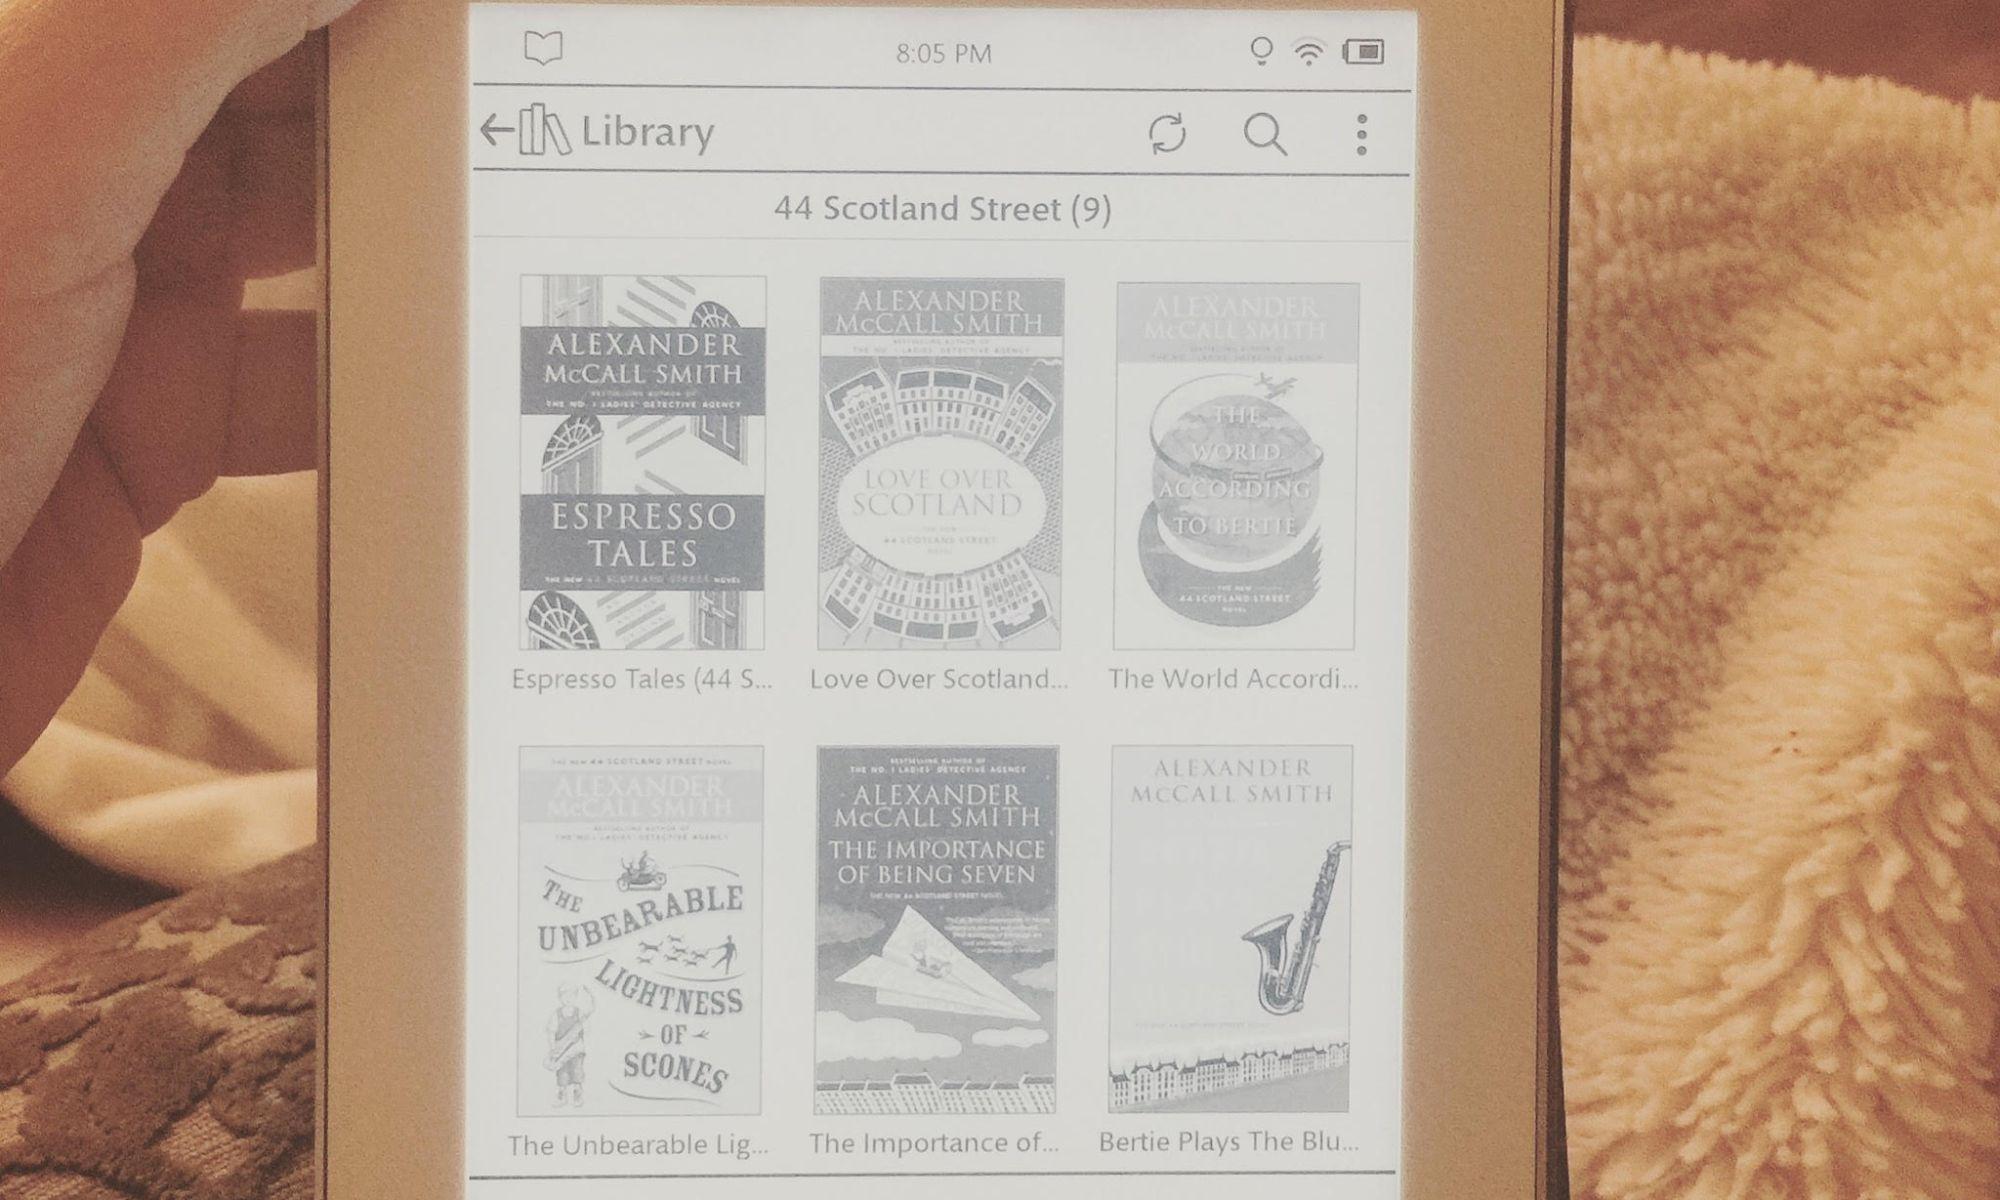 On reading the 44 Scotland Street Series